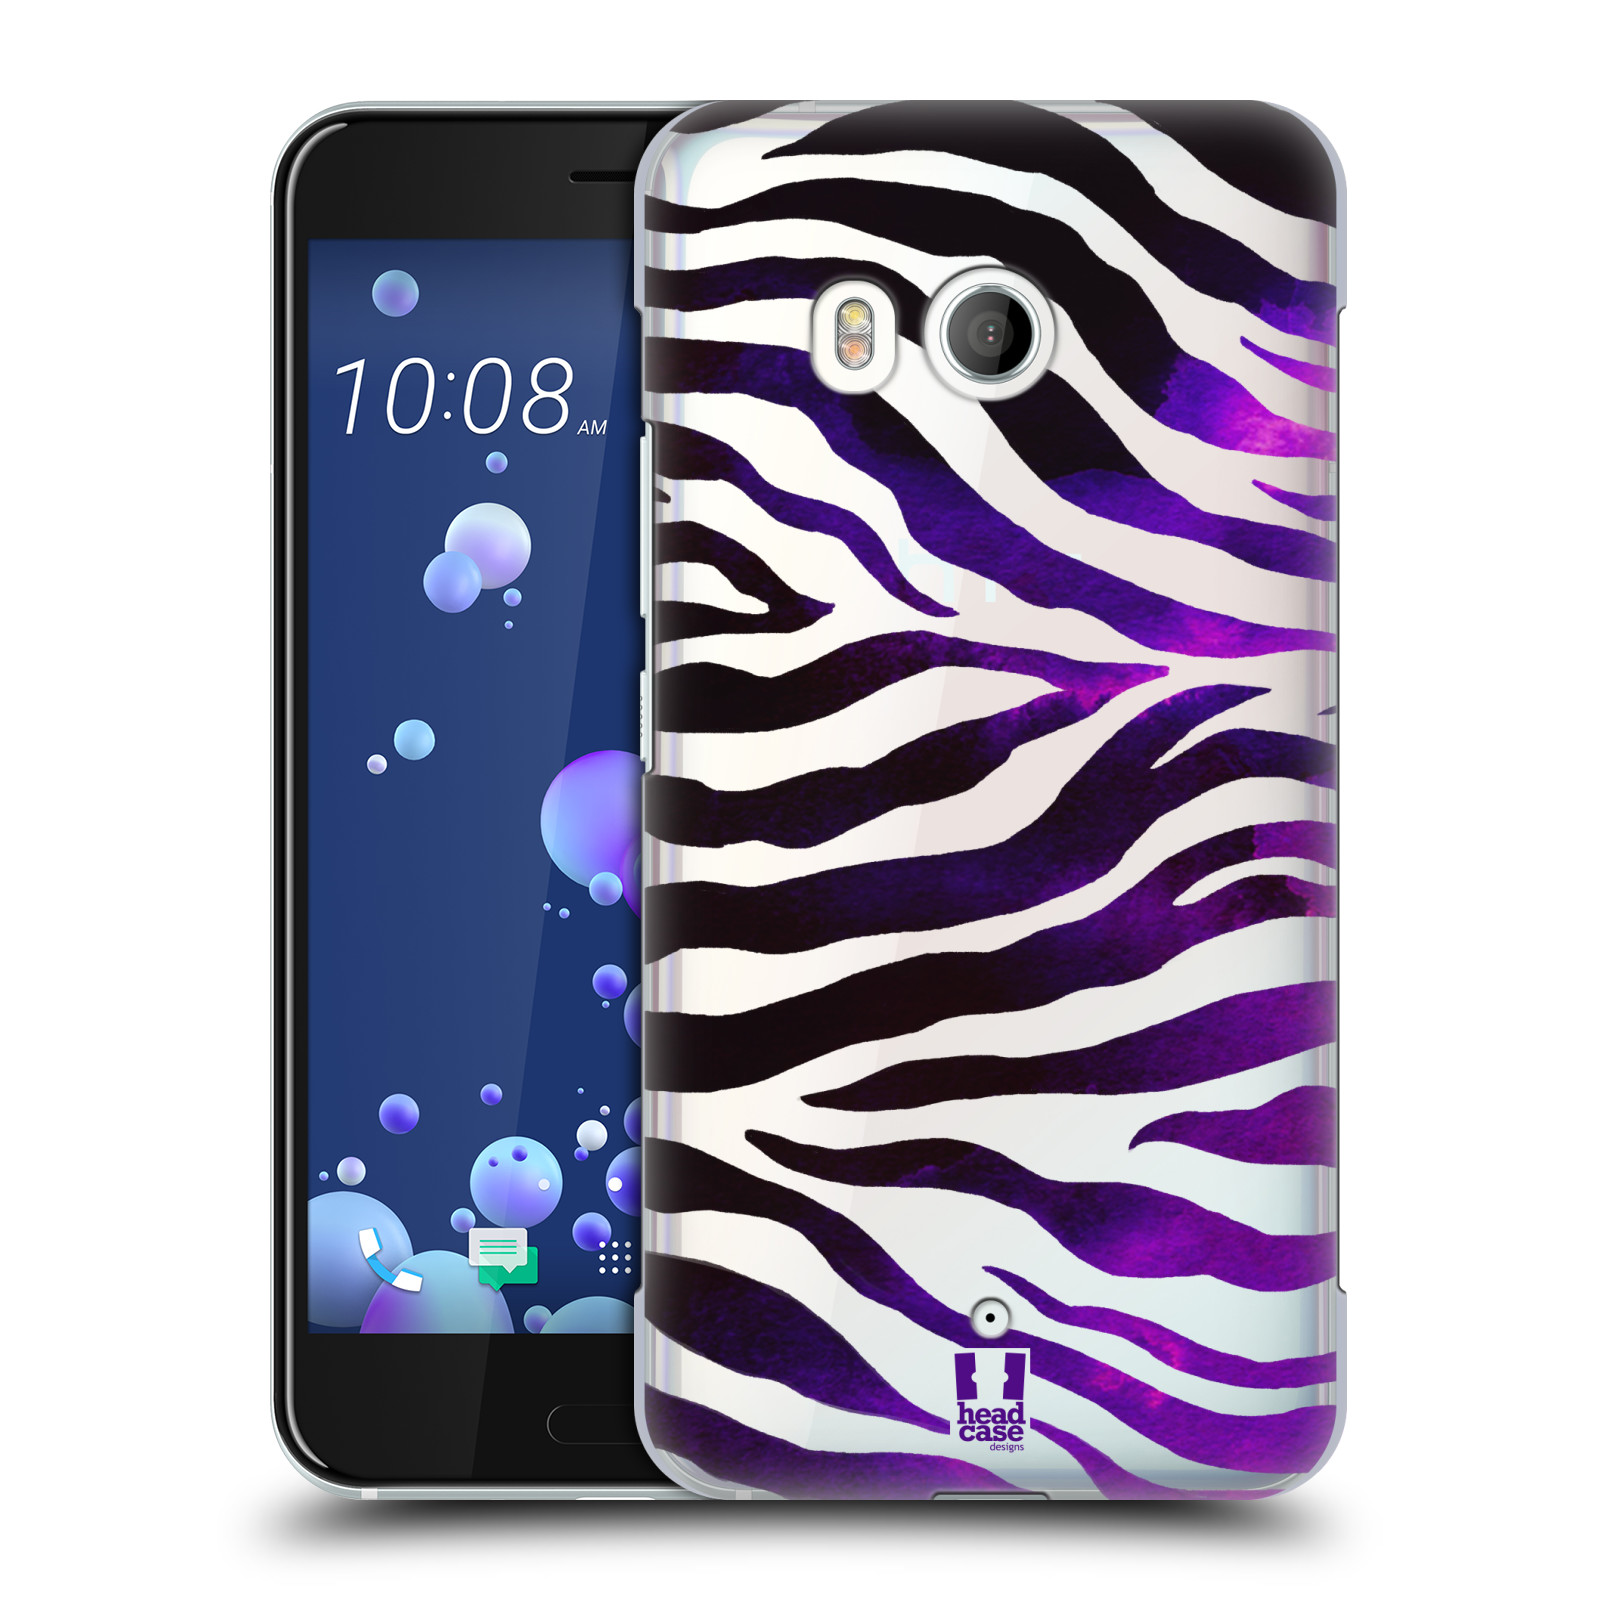 HEAD-CASE-DESIGNS-WILD-PRINT-HARD-BACK-CASE-FOR-HTC-PHONES-1